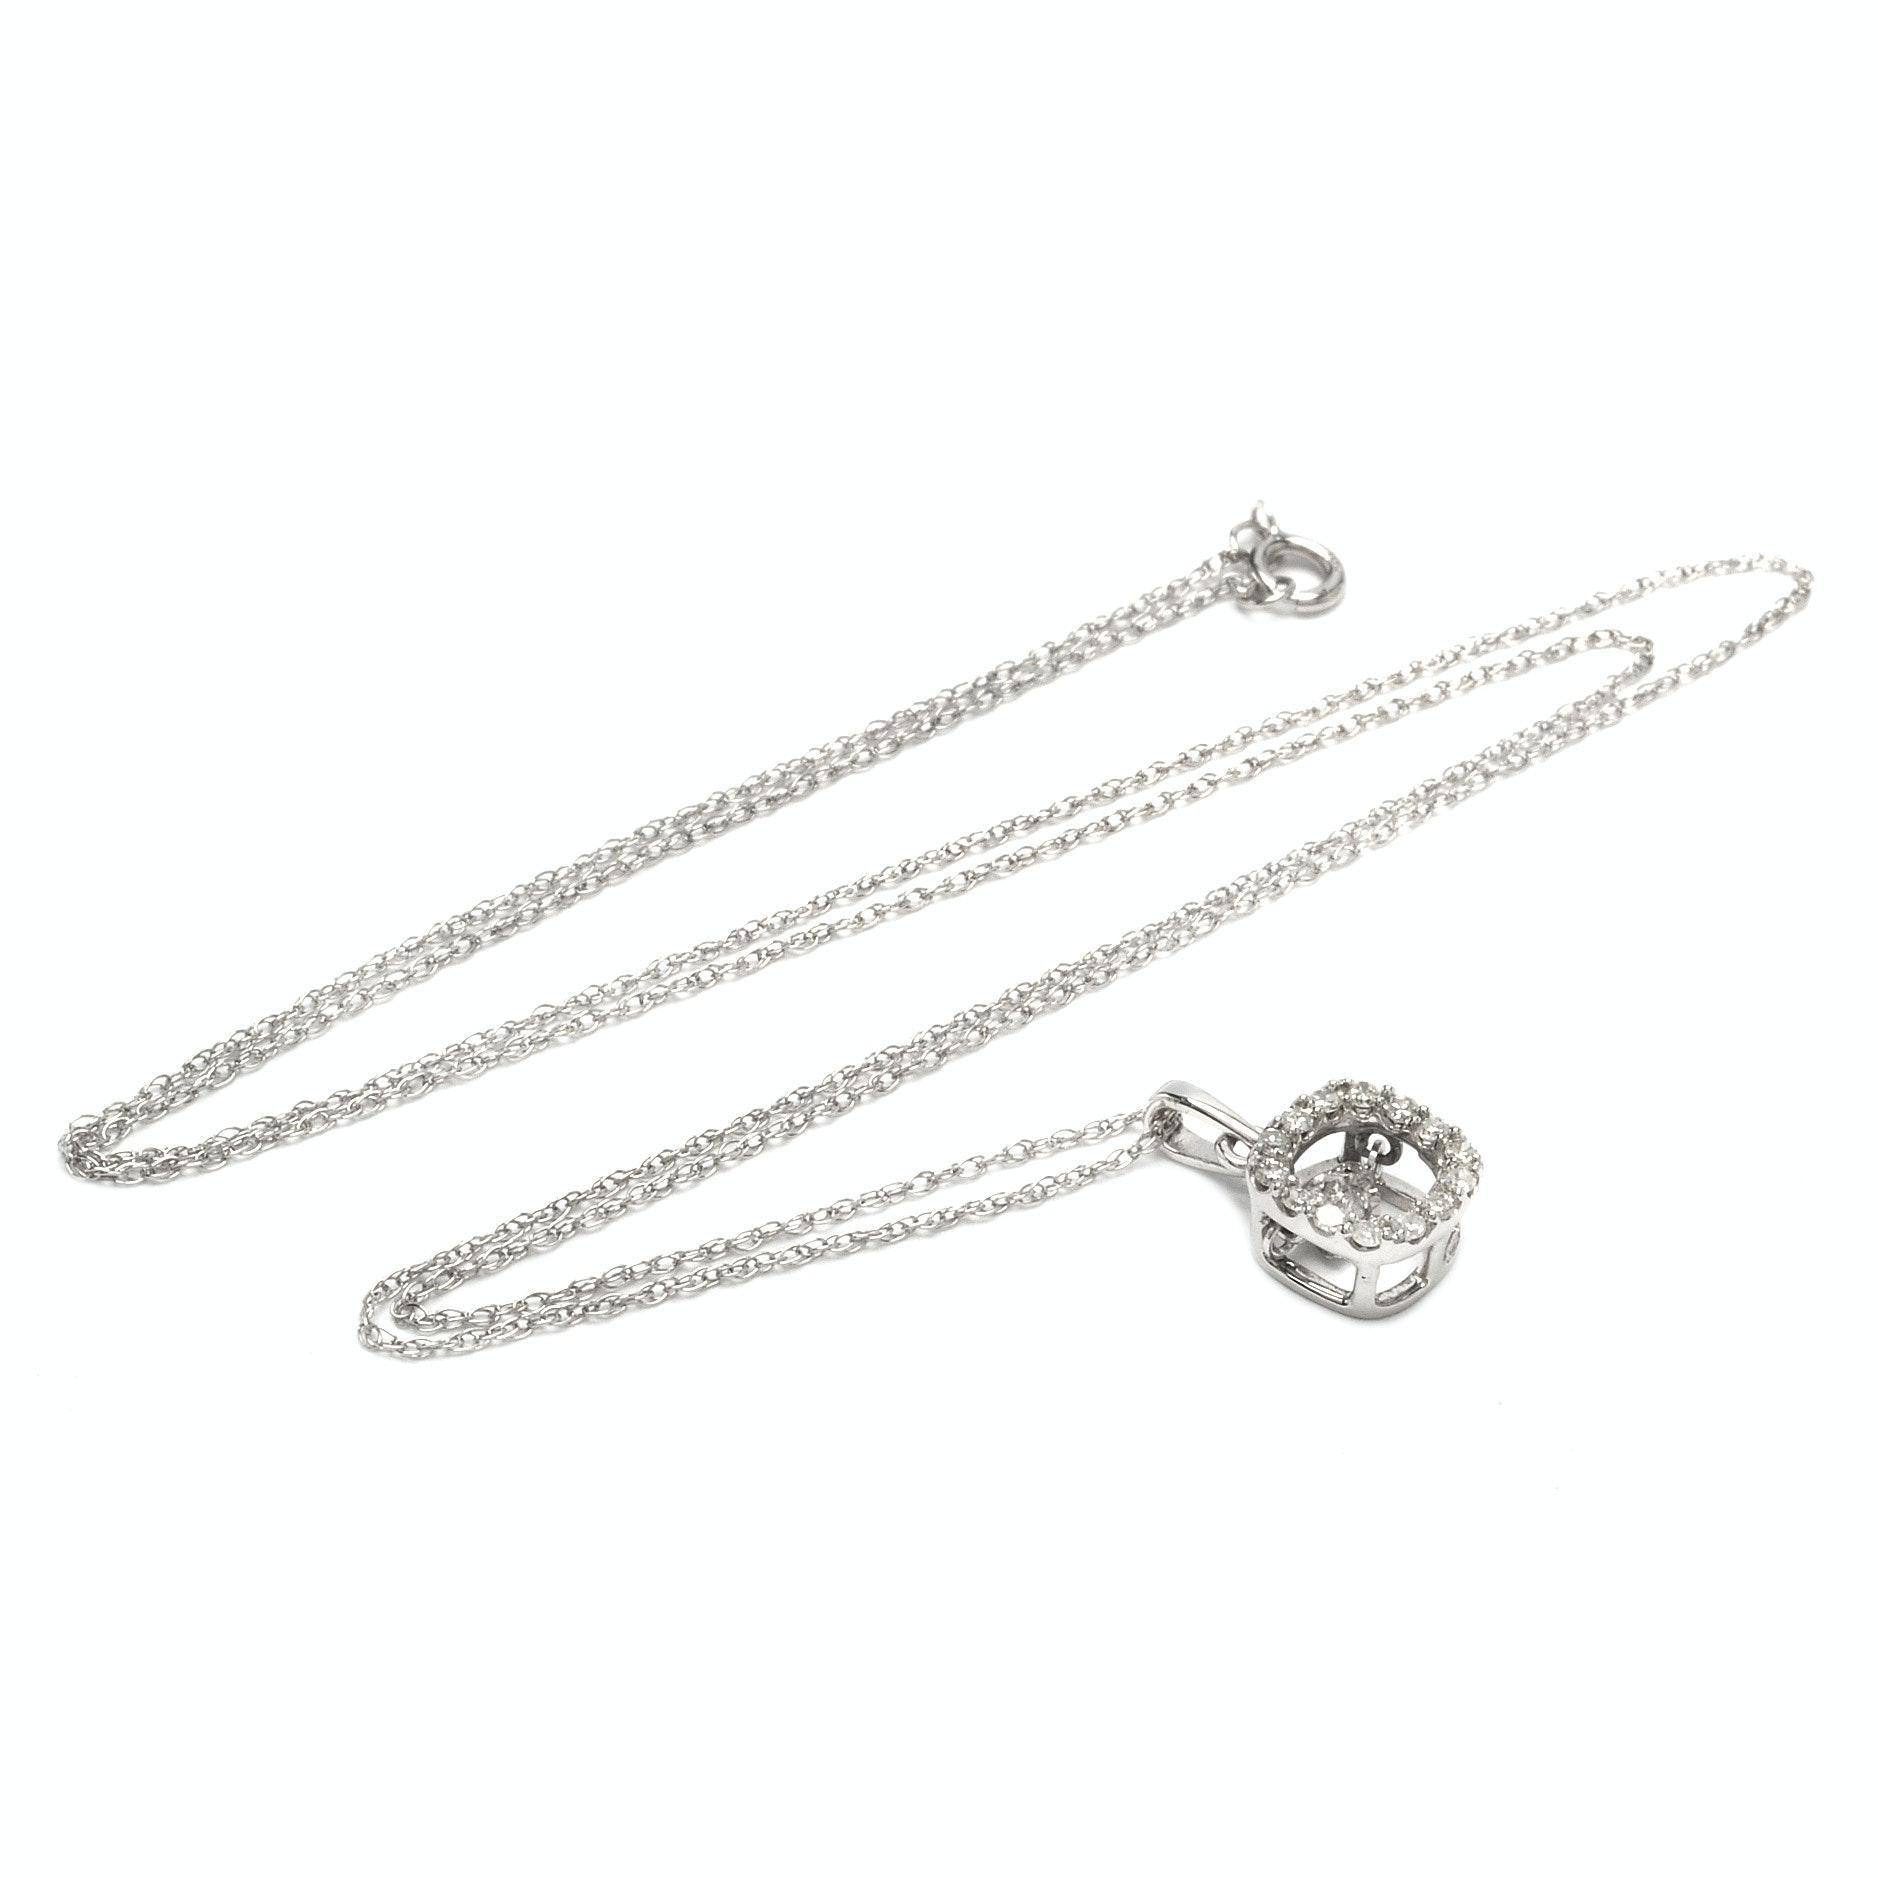 10K White Gold Love in Motion™ Diamond Pendant Necklace